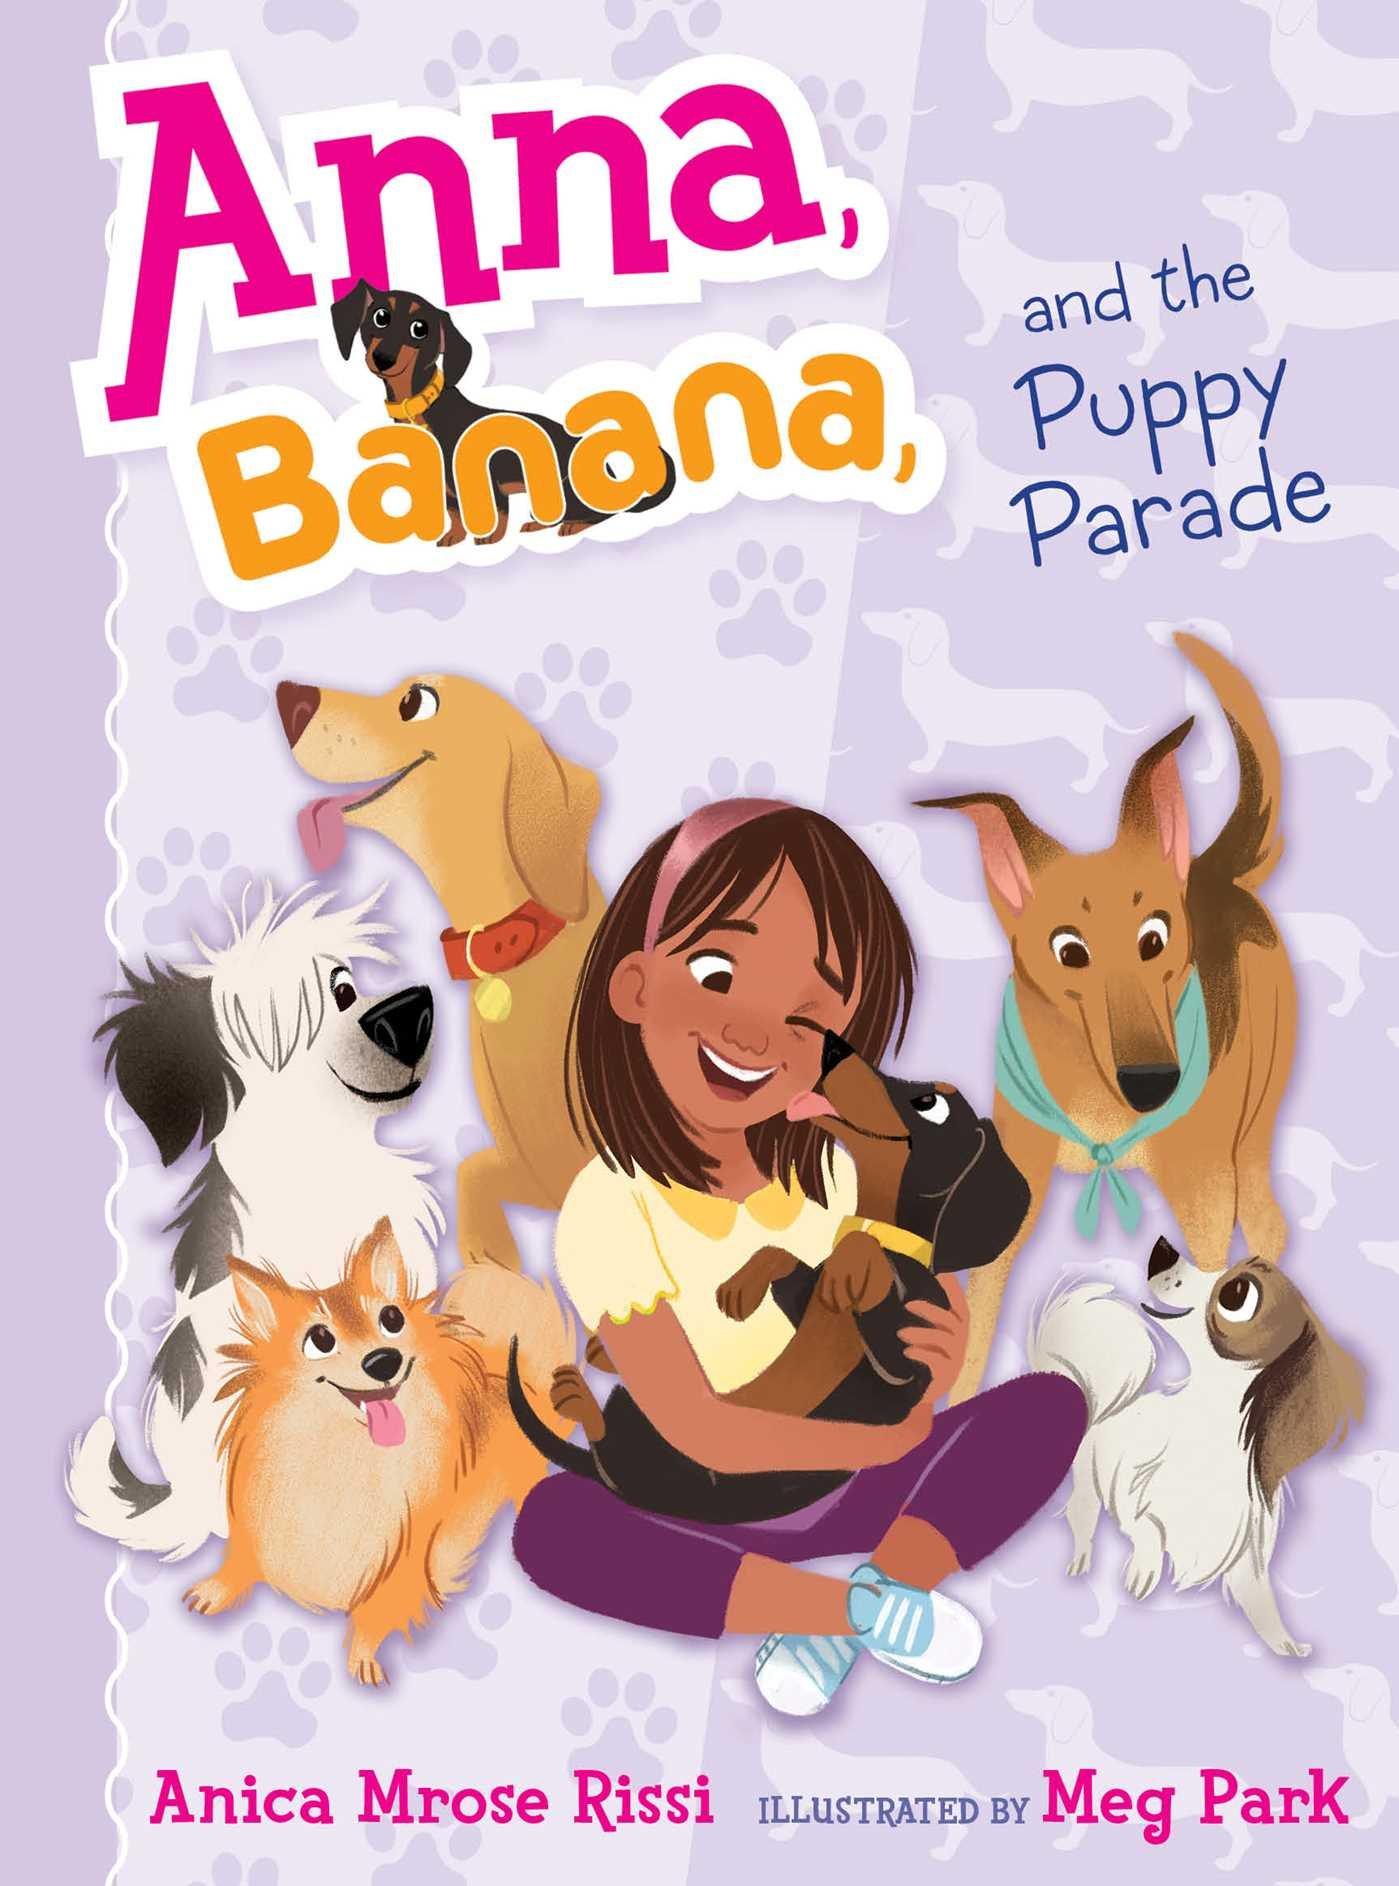 Anna, Banana, and the Puppy Parade Image